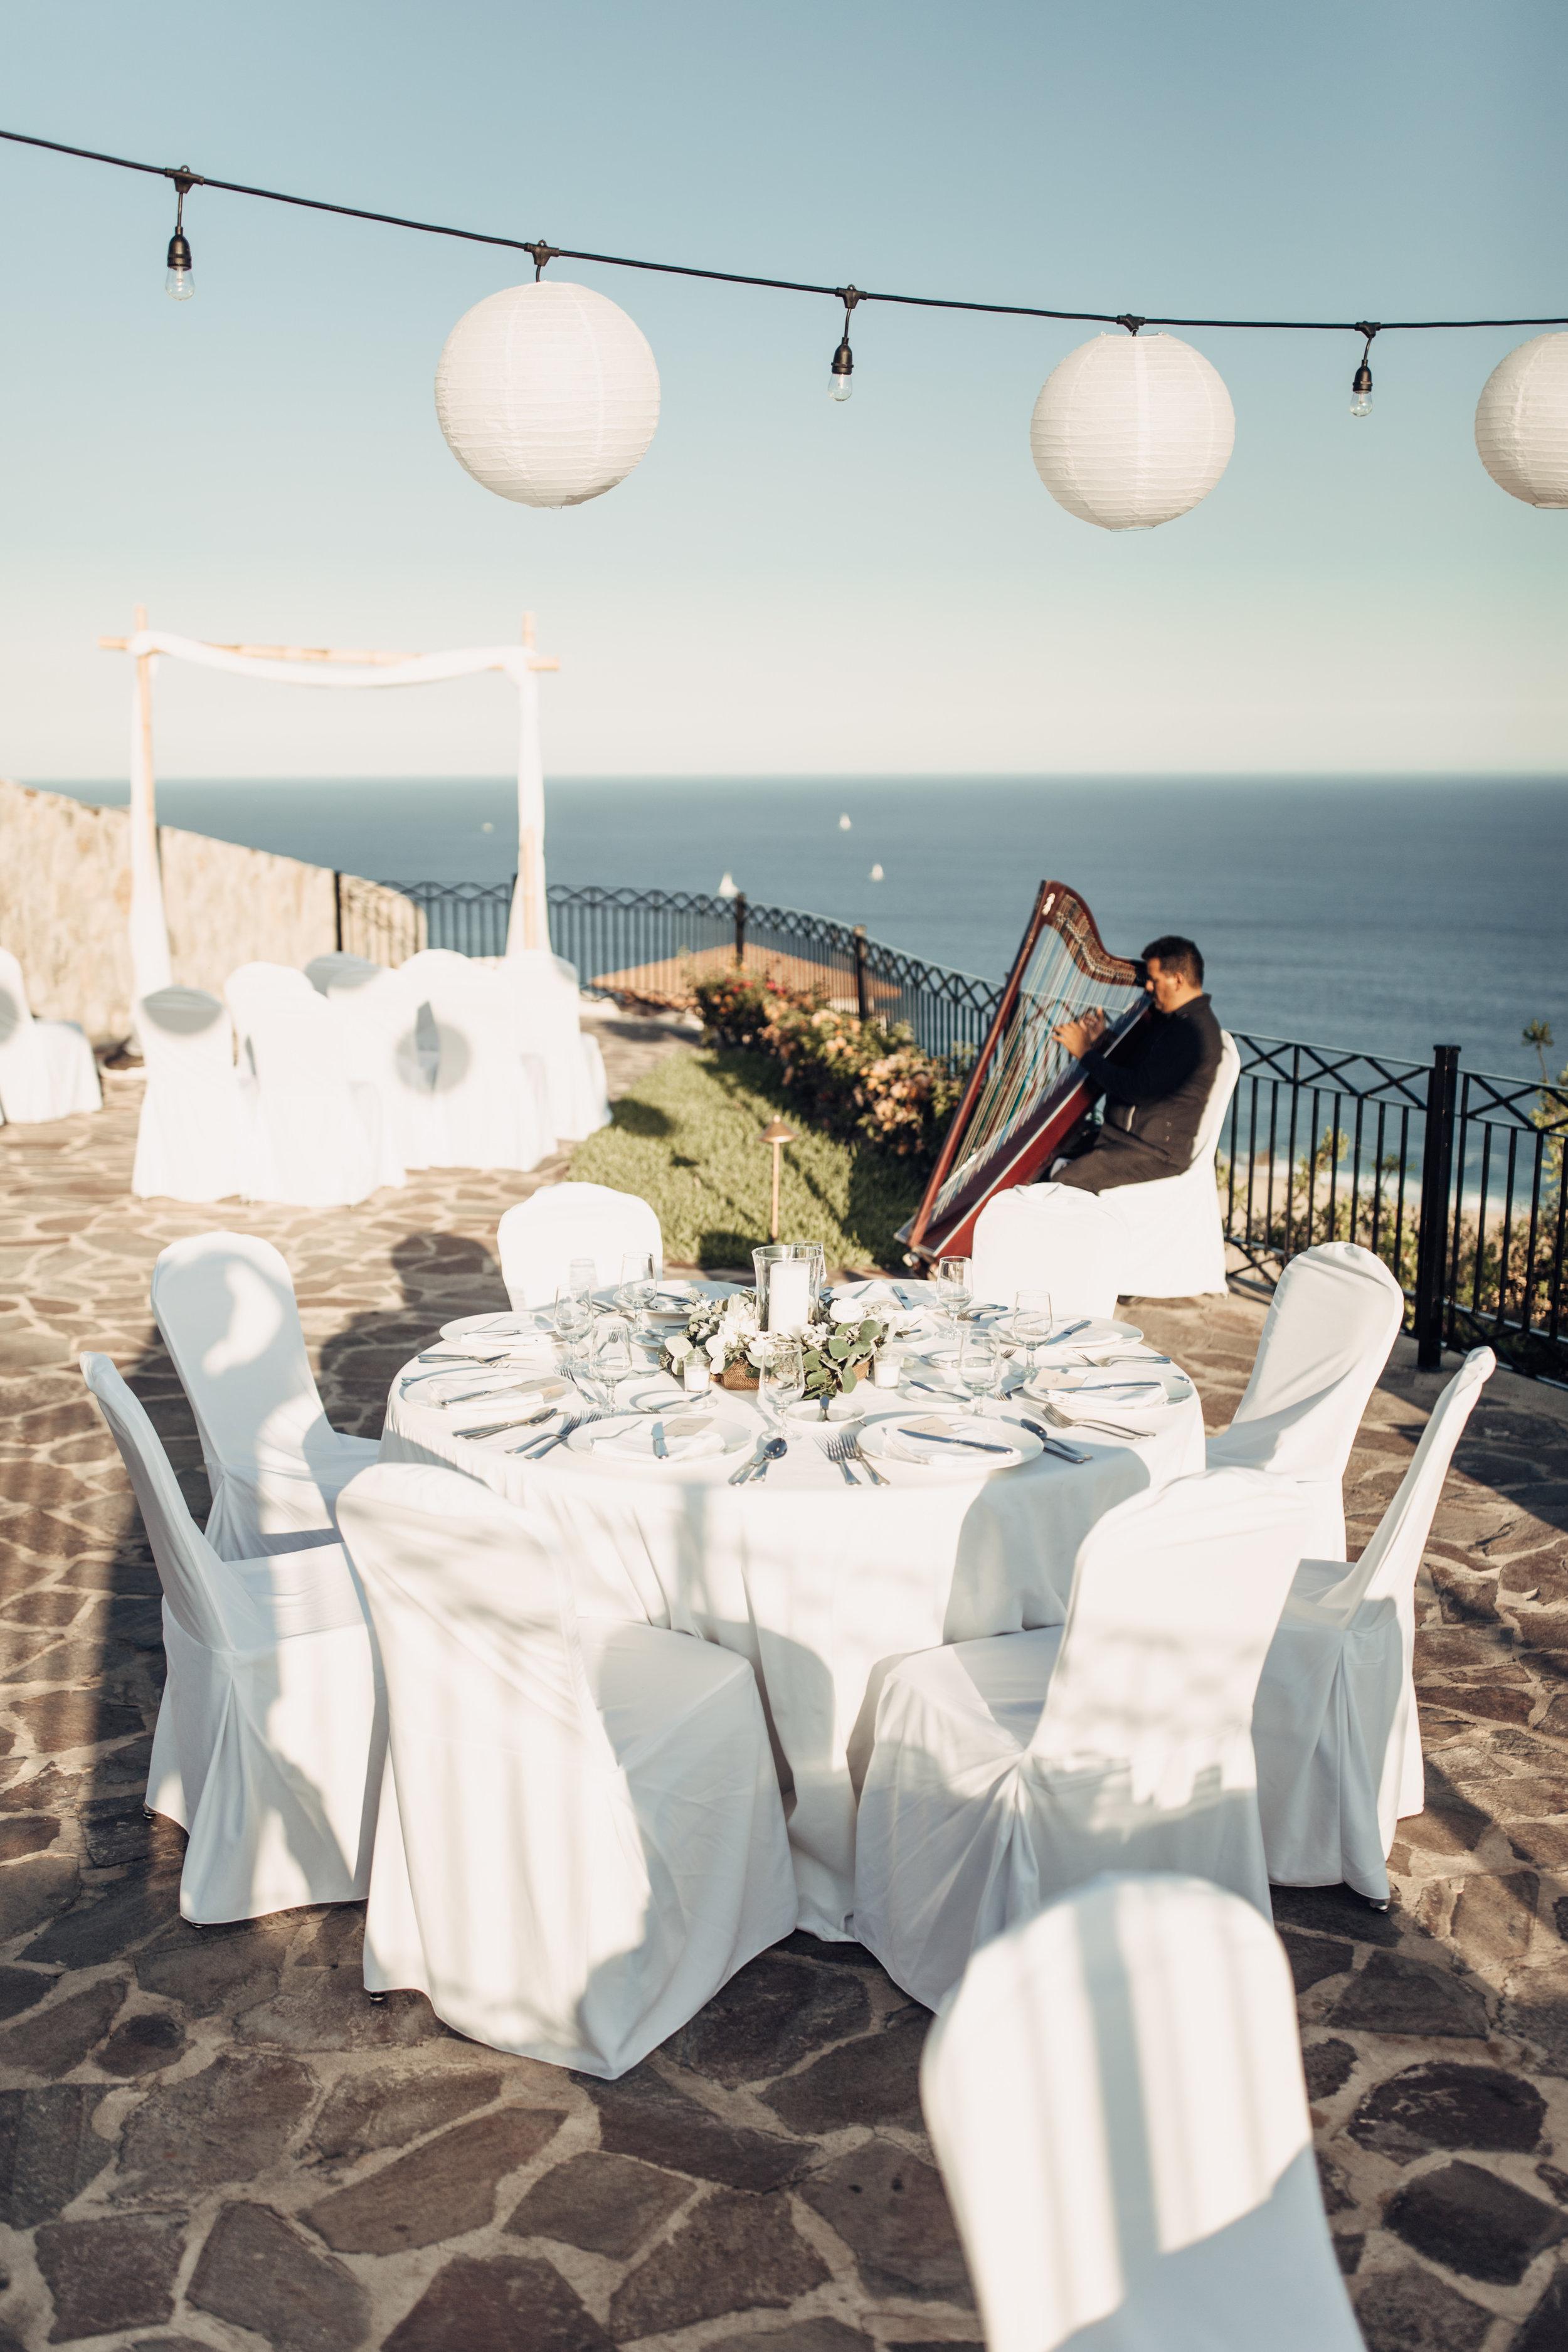 pueblo-bonito-sunset-beach-wedding-cabo-san-lucas379.jpg